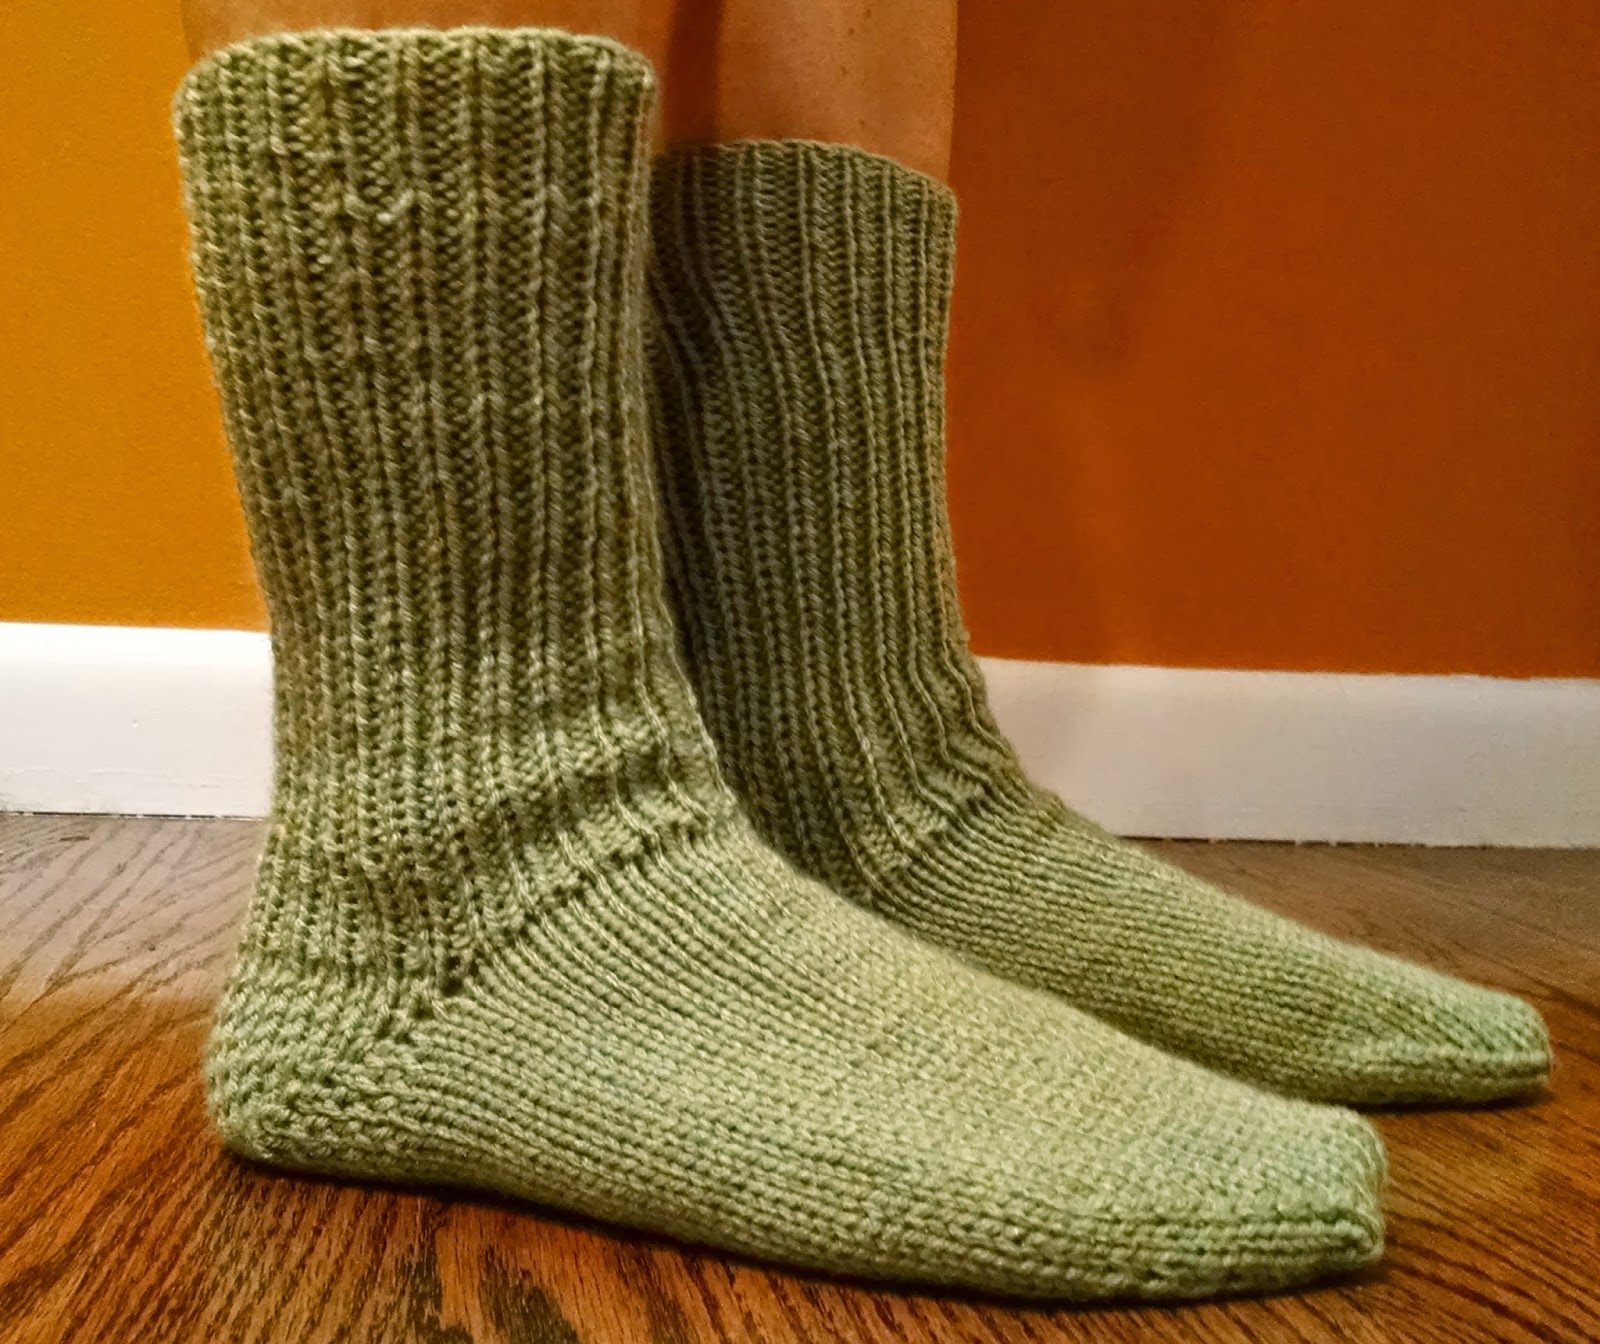 Slouch Socks Knitting Pattern : Slouch Socks in the Knitted Slipper Book Knit A Bit Crochet Away